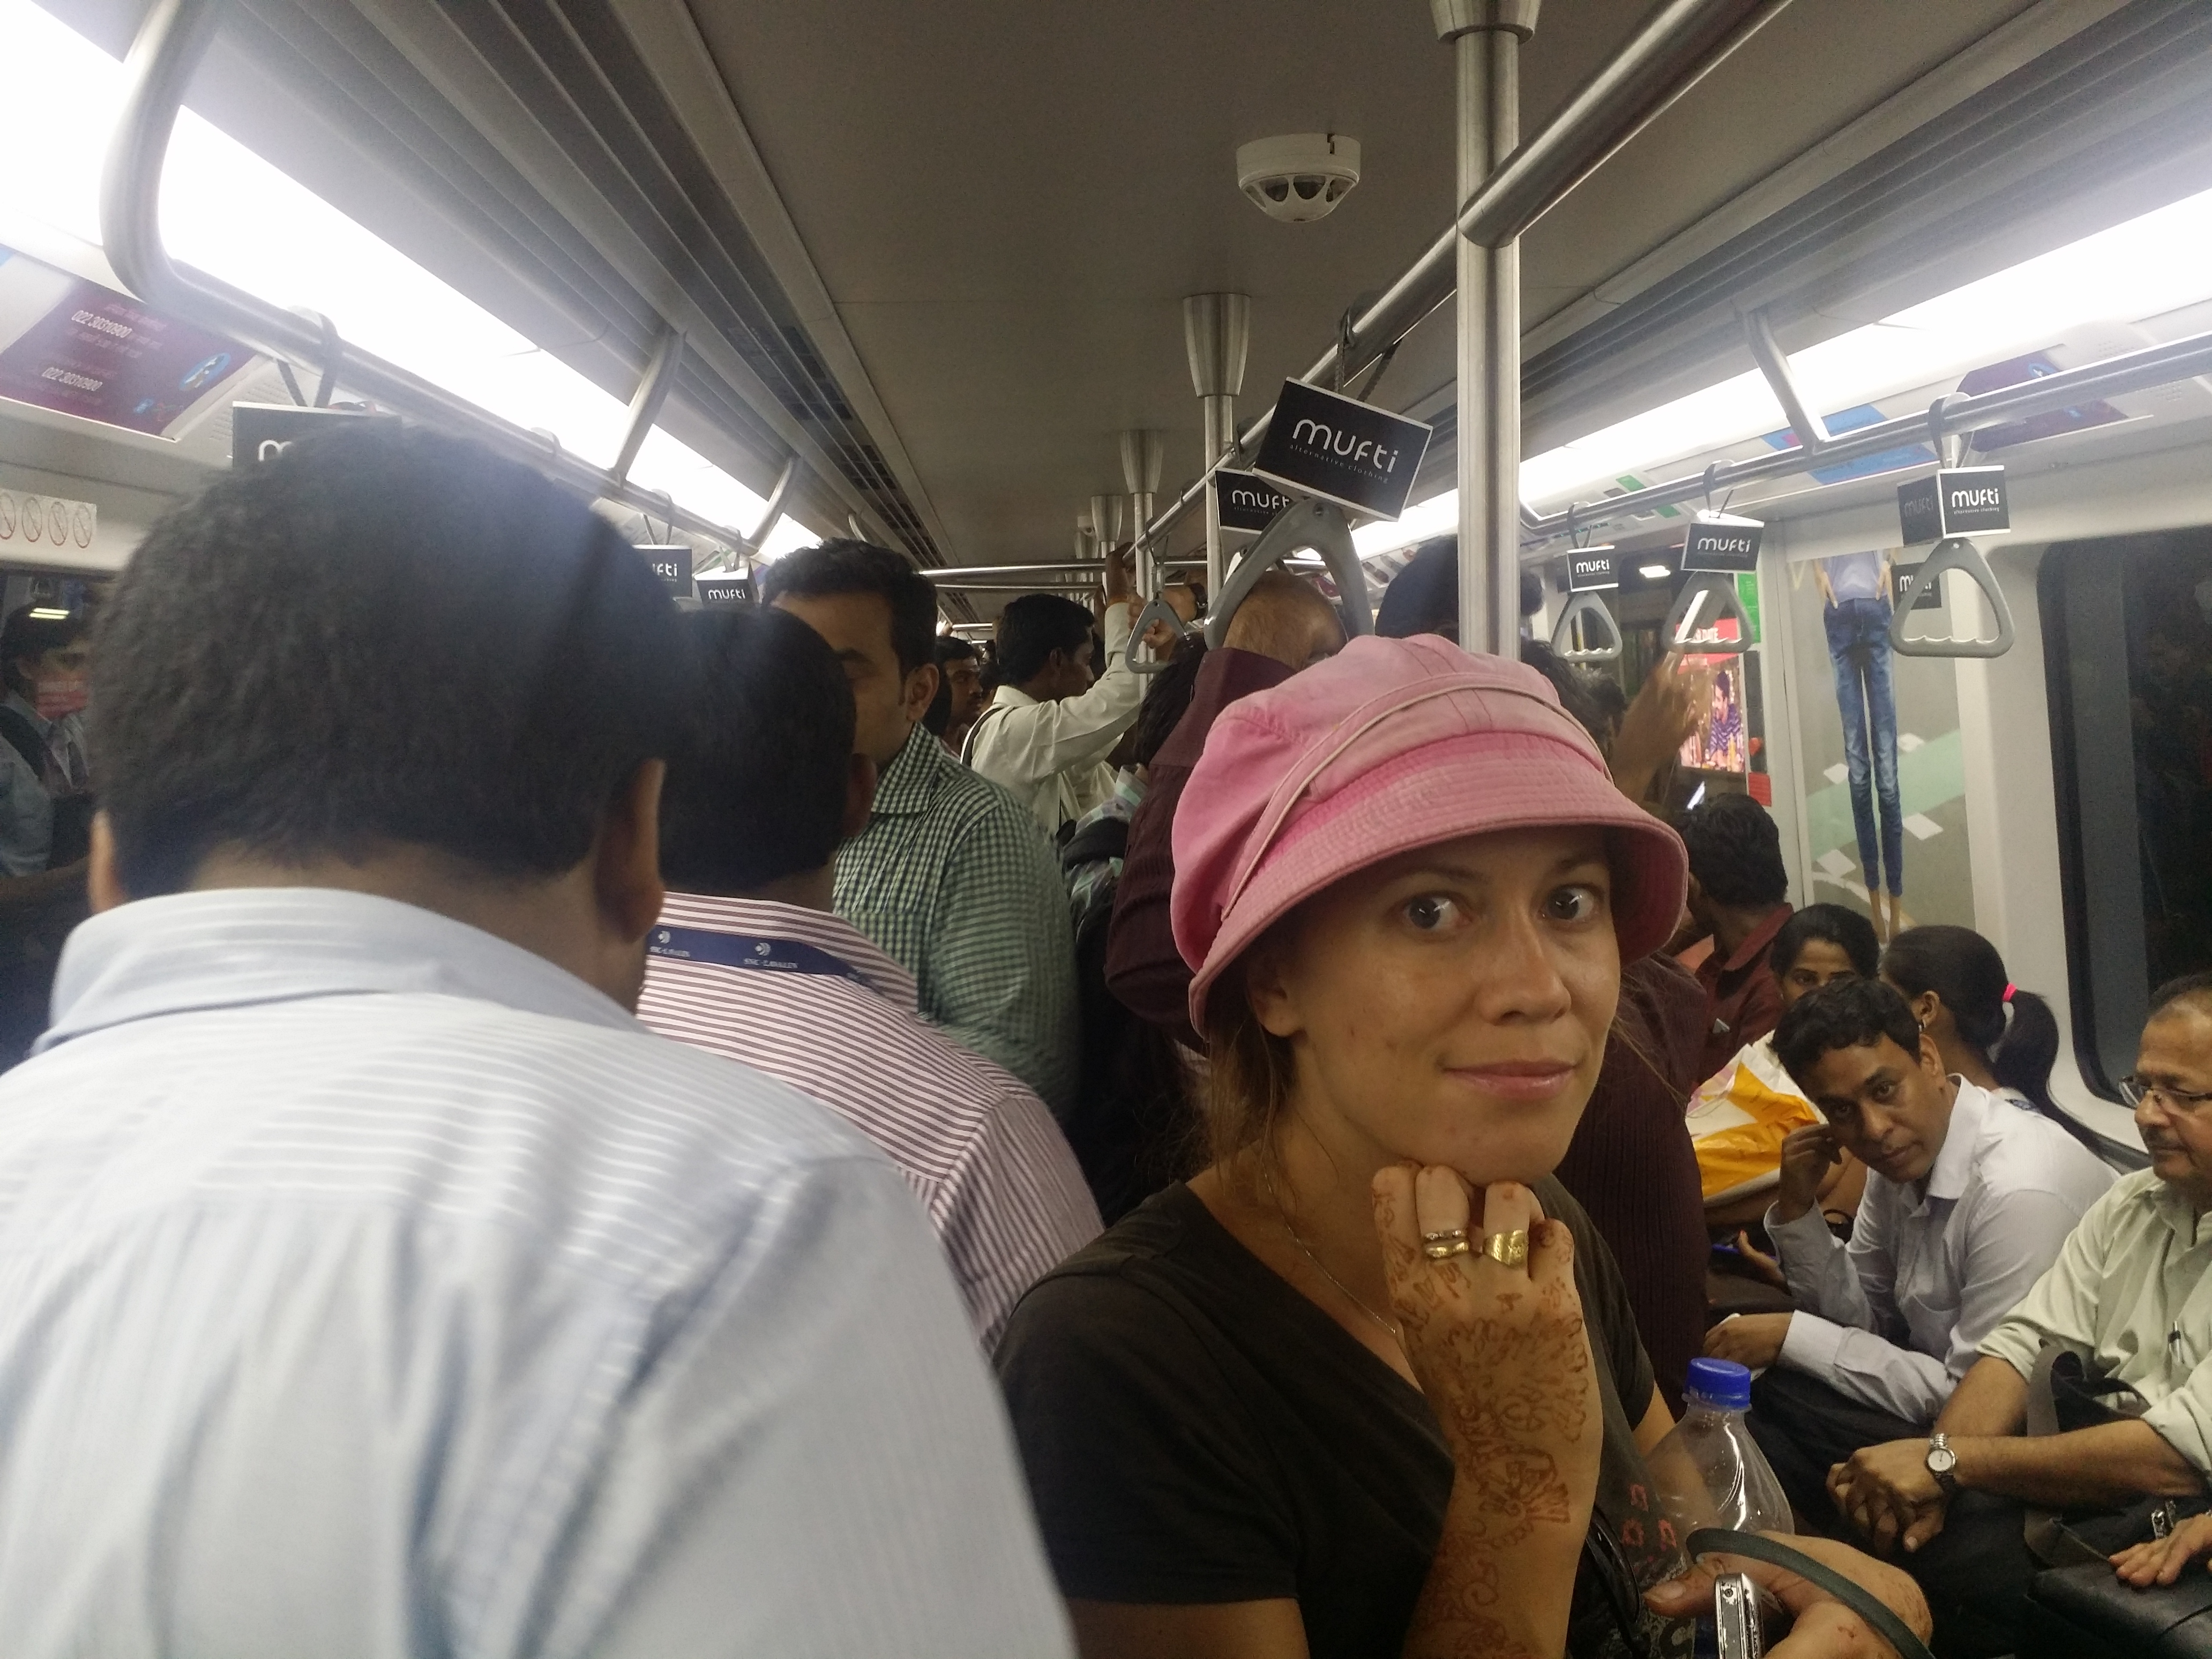 Mumbai flicka gratis dating